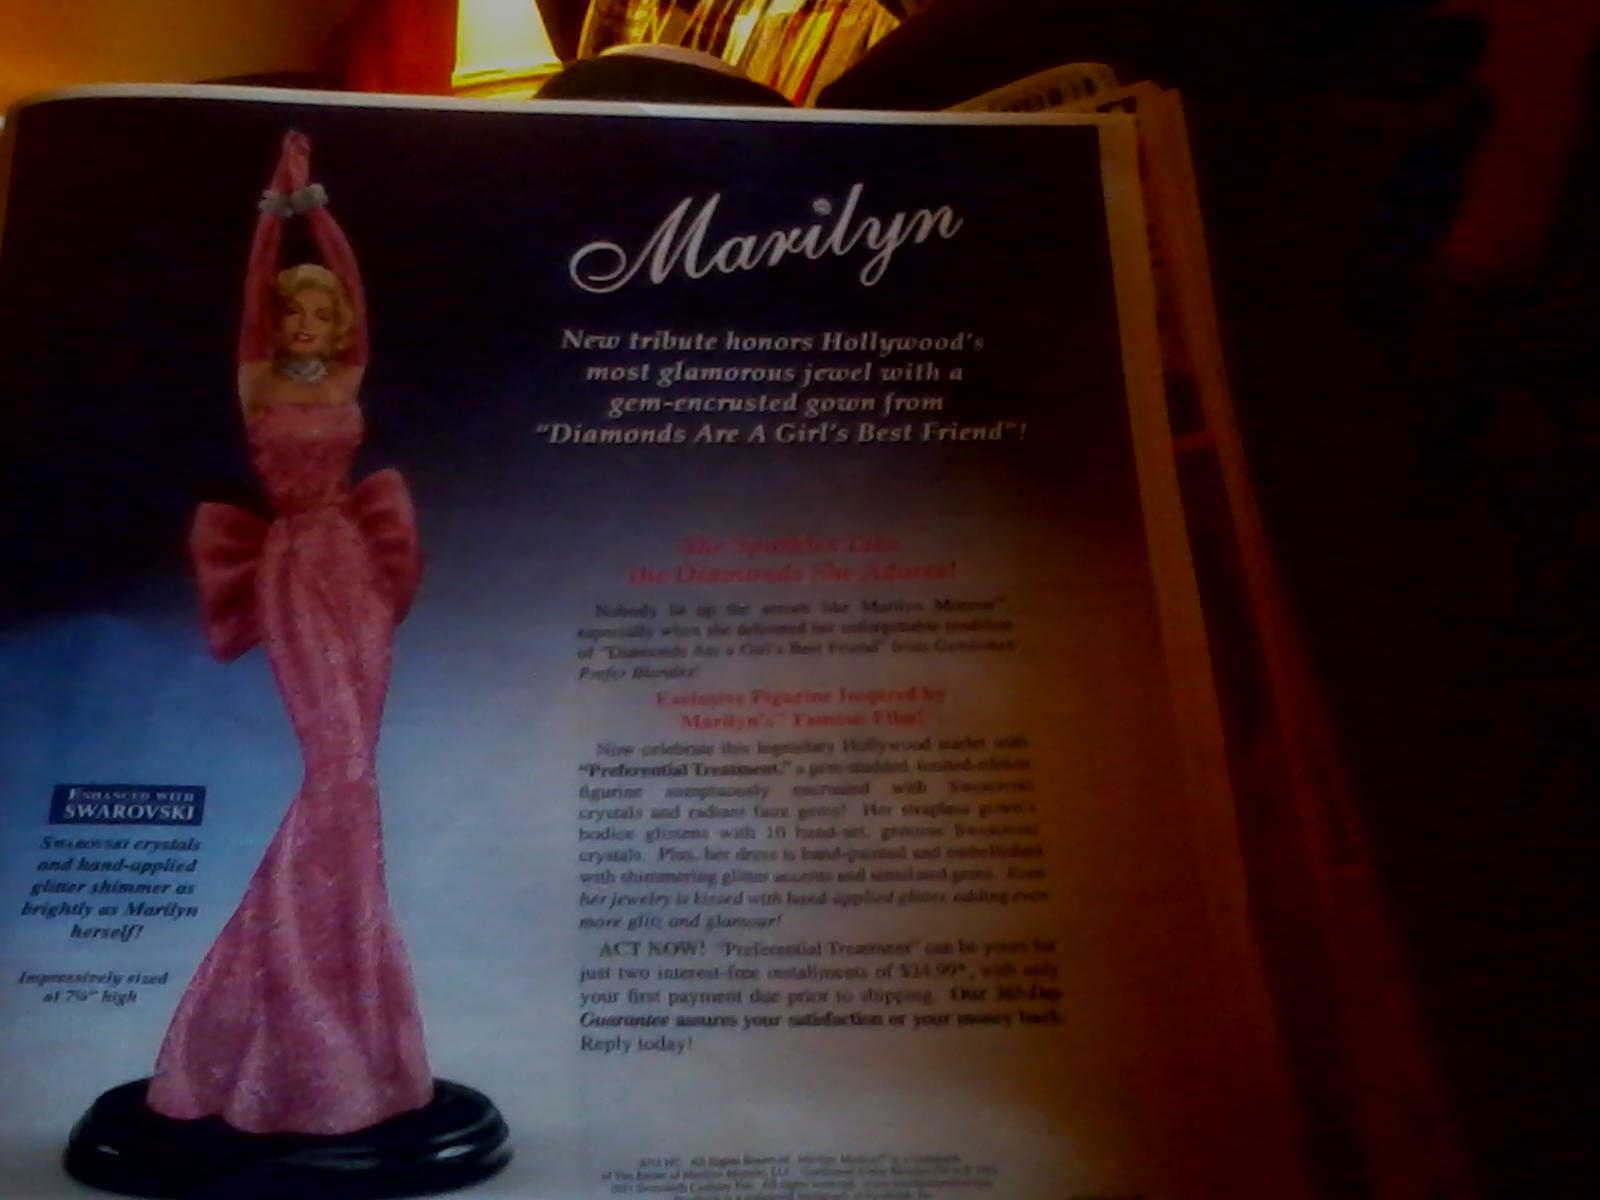 http://4.bp.blogspot.com/-tOpYNGrMFQM/T2doocwSkQI/AAAAAAAAAw8/S-bA3OdBFL4/s1600/Marilyn+Monroe+statue.jpg